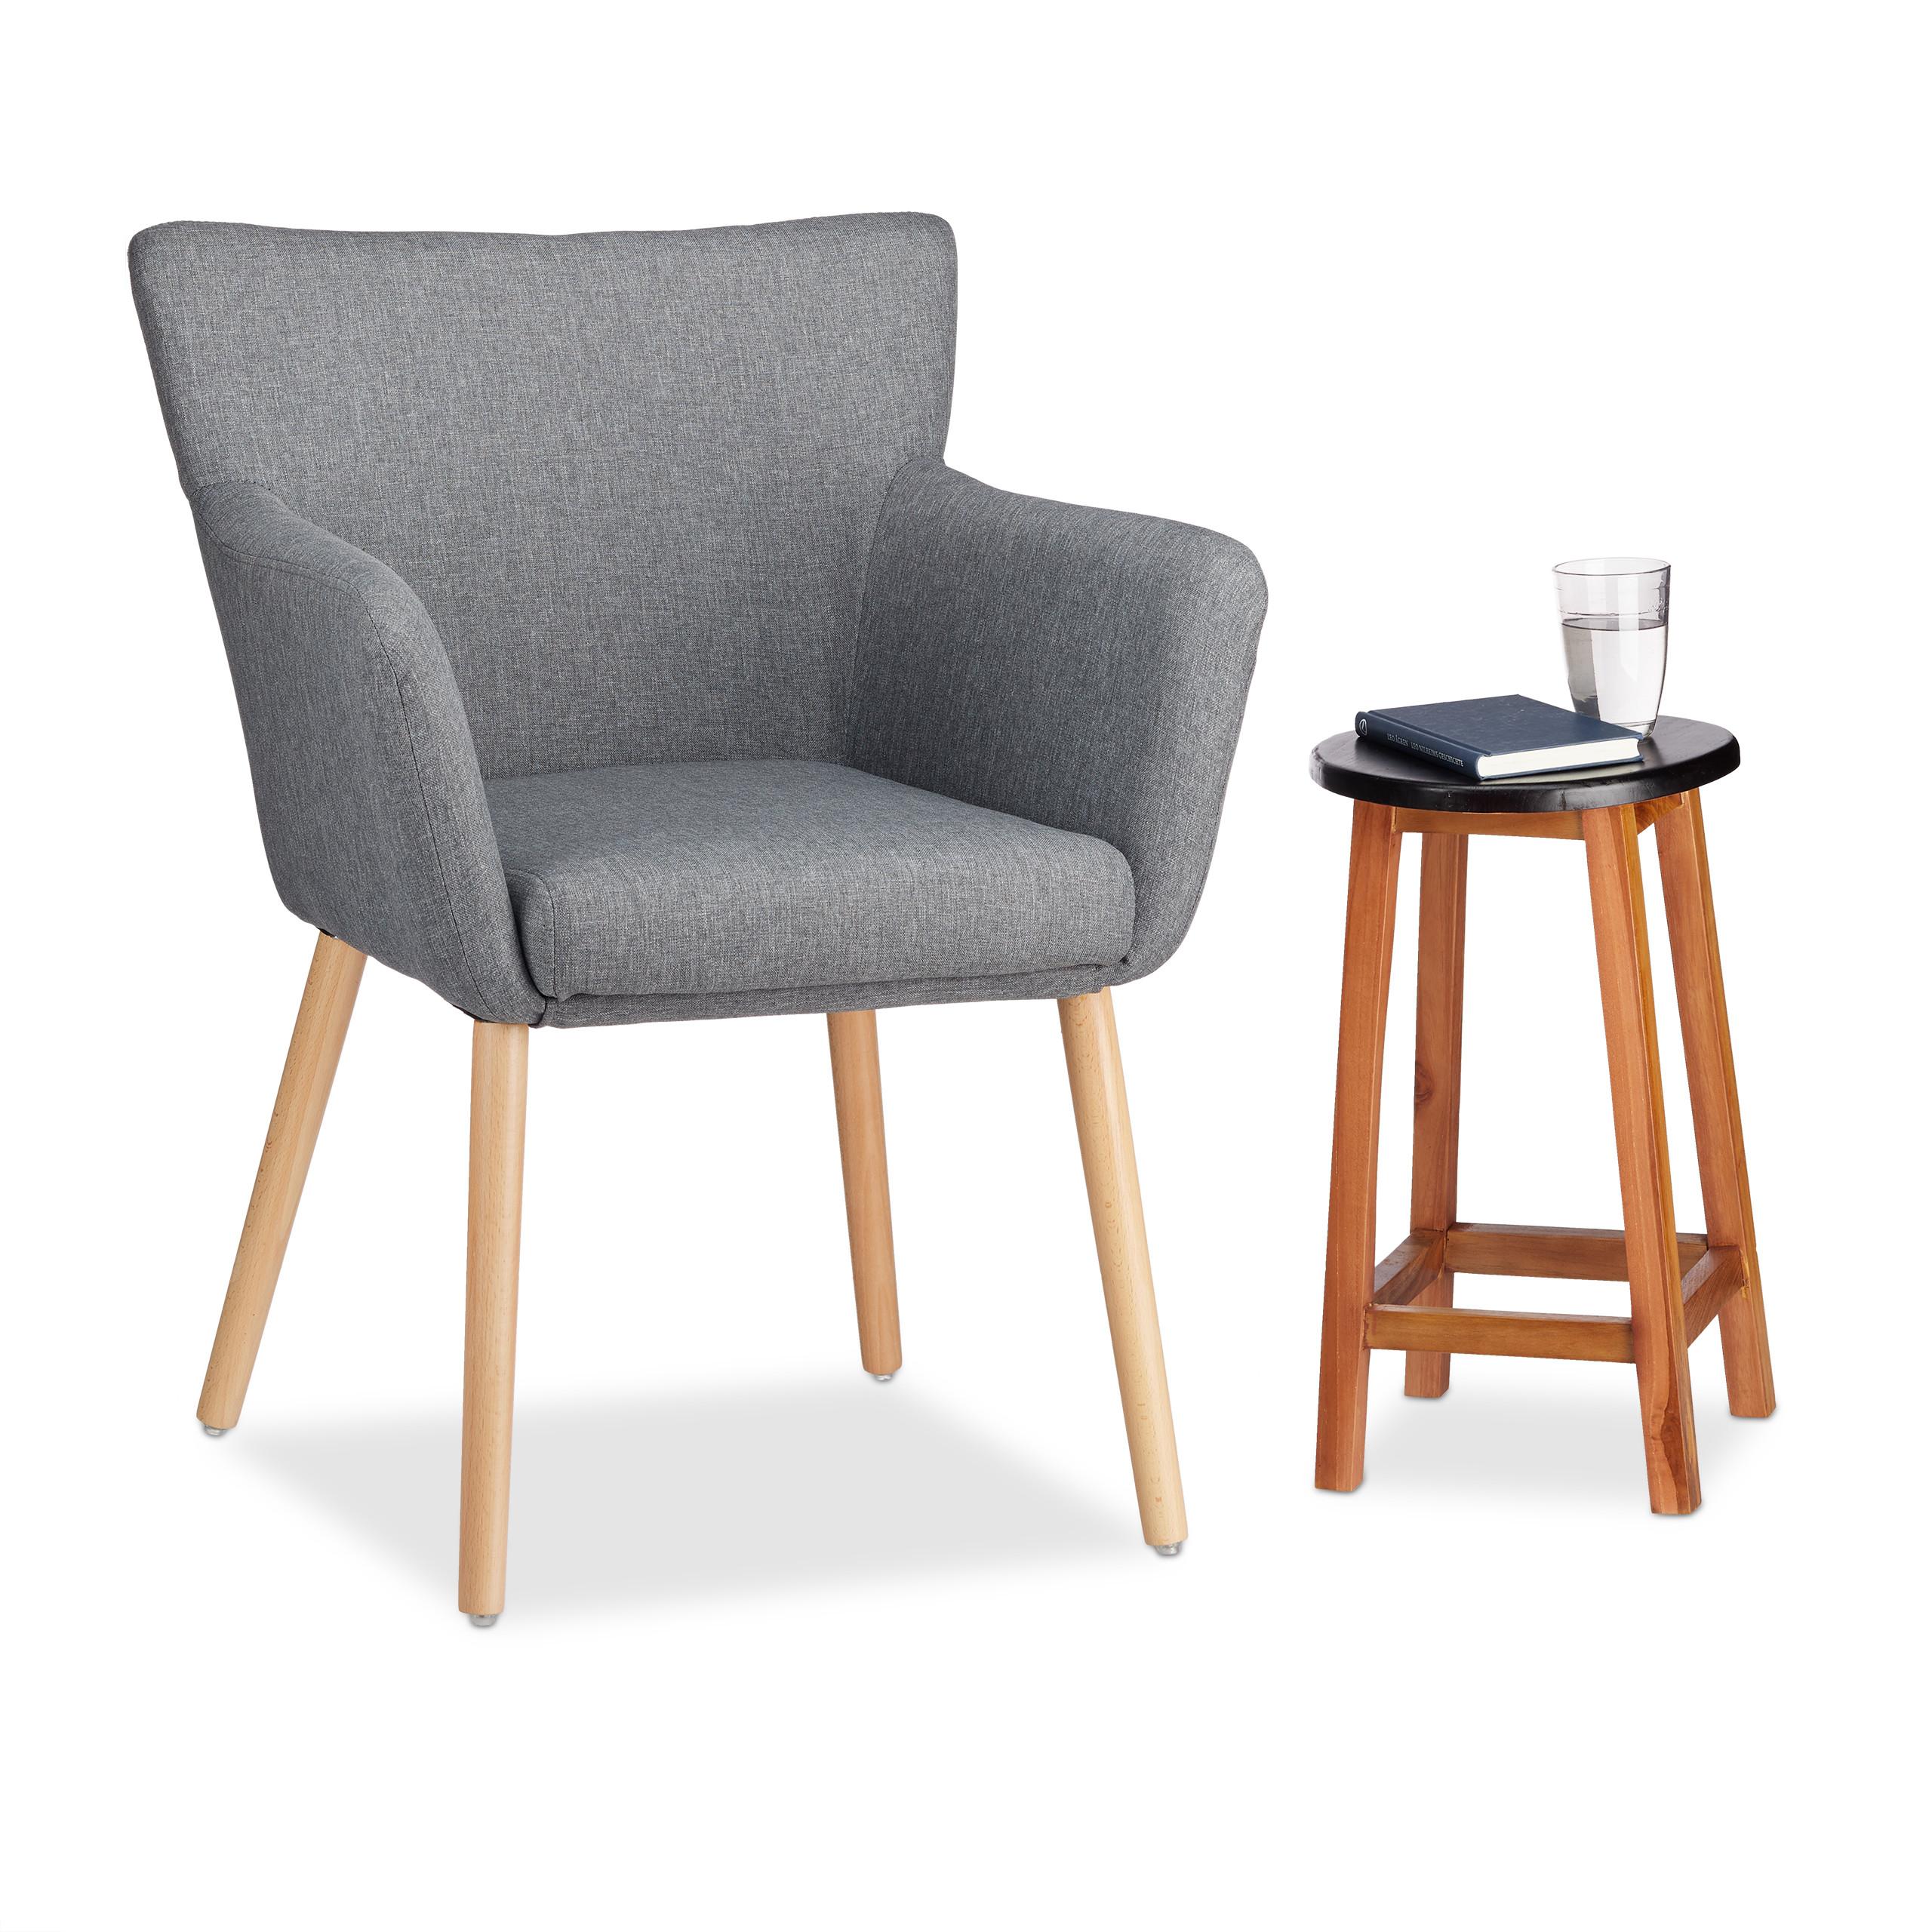 Upholstered Armchair, Modern Design, Fabric, Relaxing